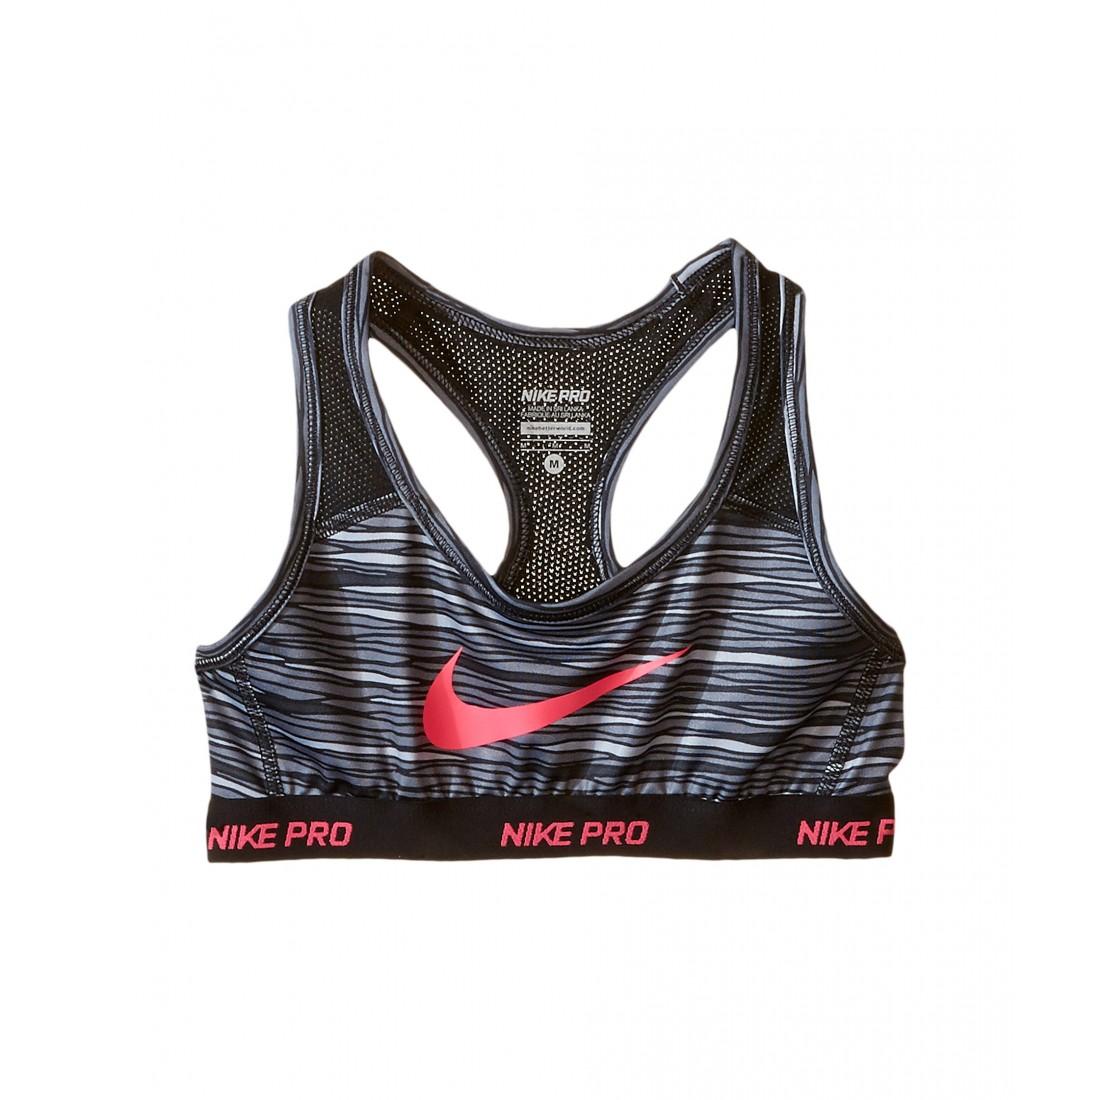 75e5cd1ffffba Nike Kids Pro Hypercool Allover Print 2 Sports Bra (Little Kids Big Kids)